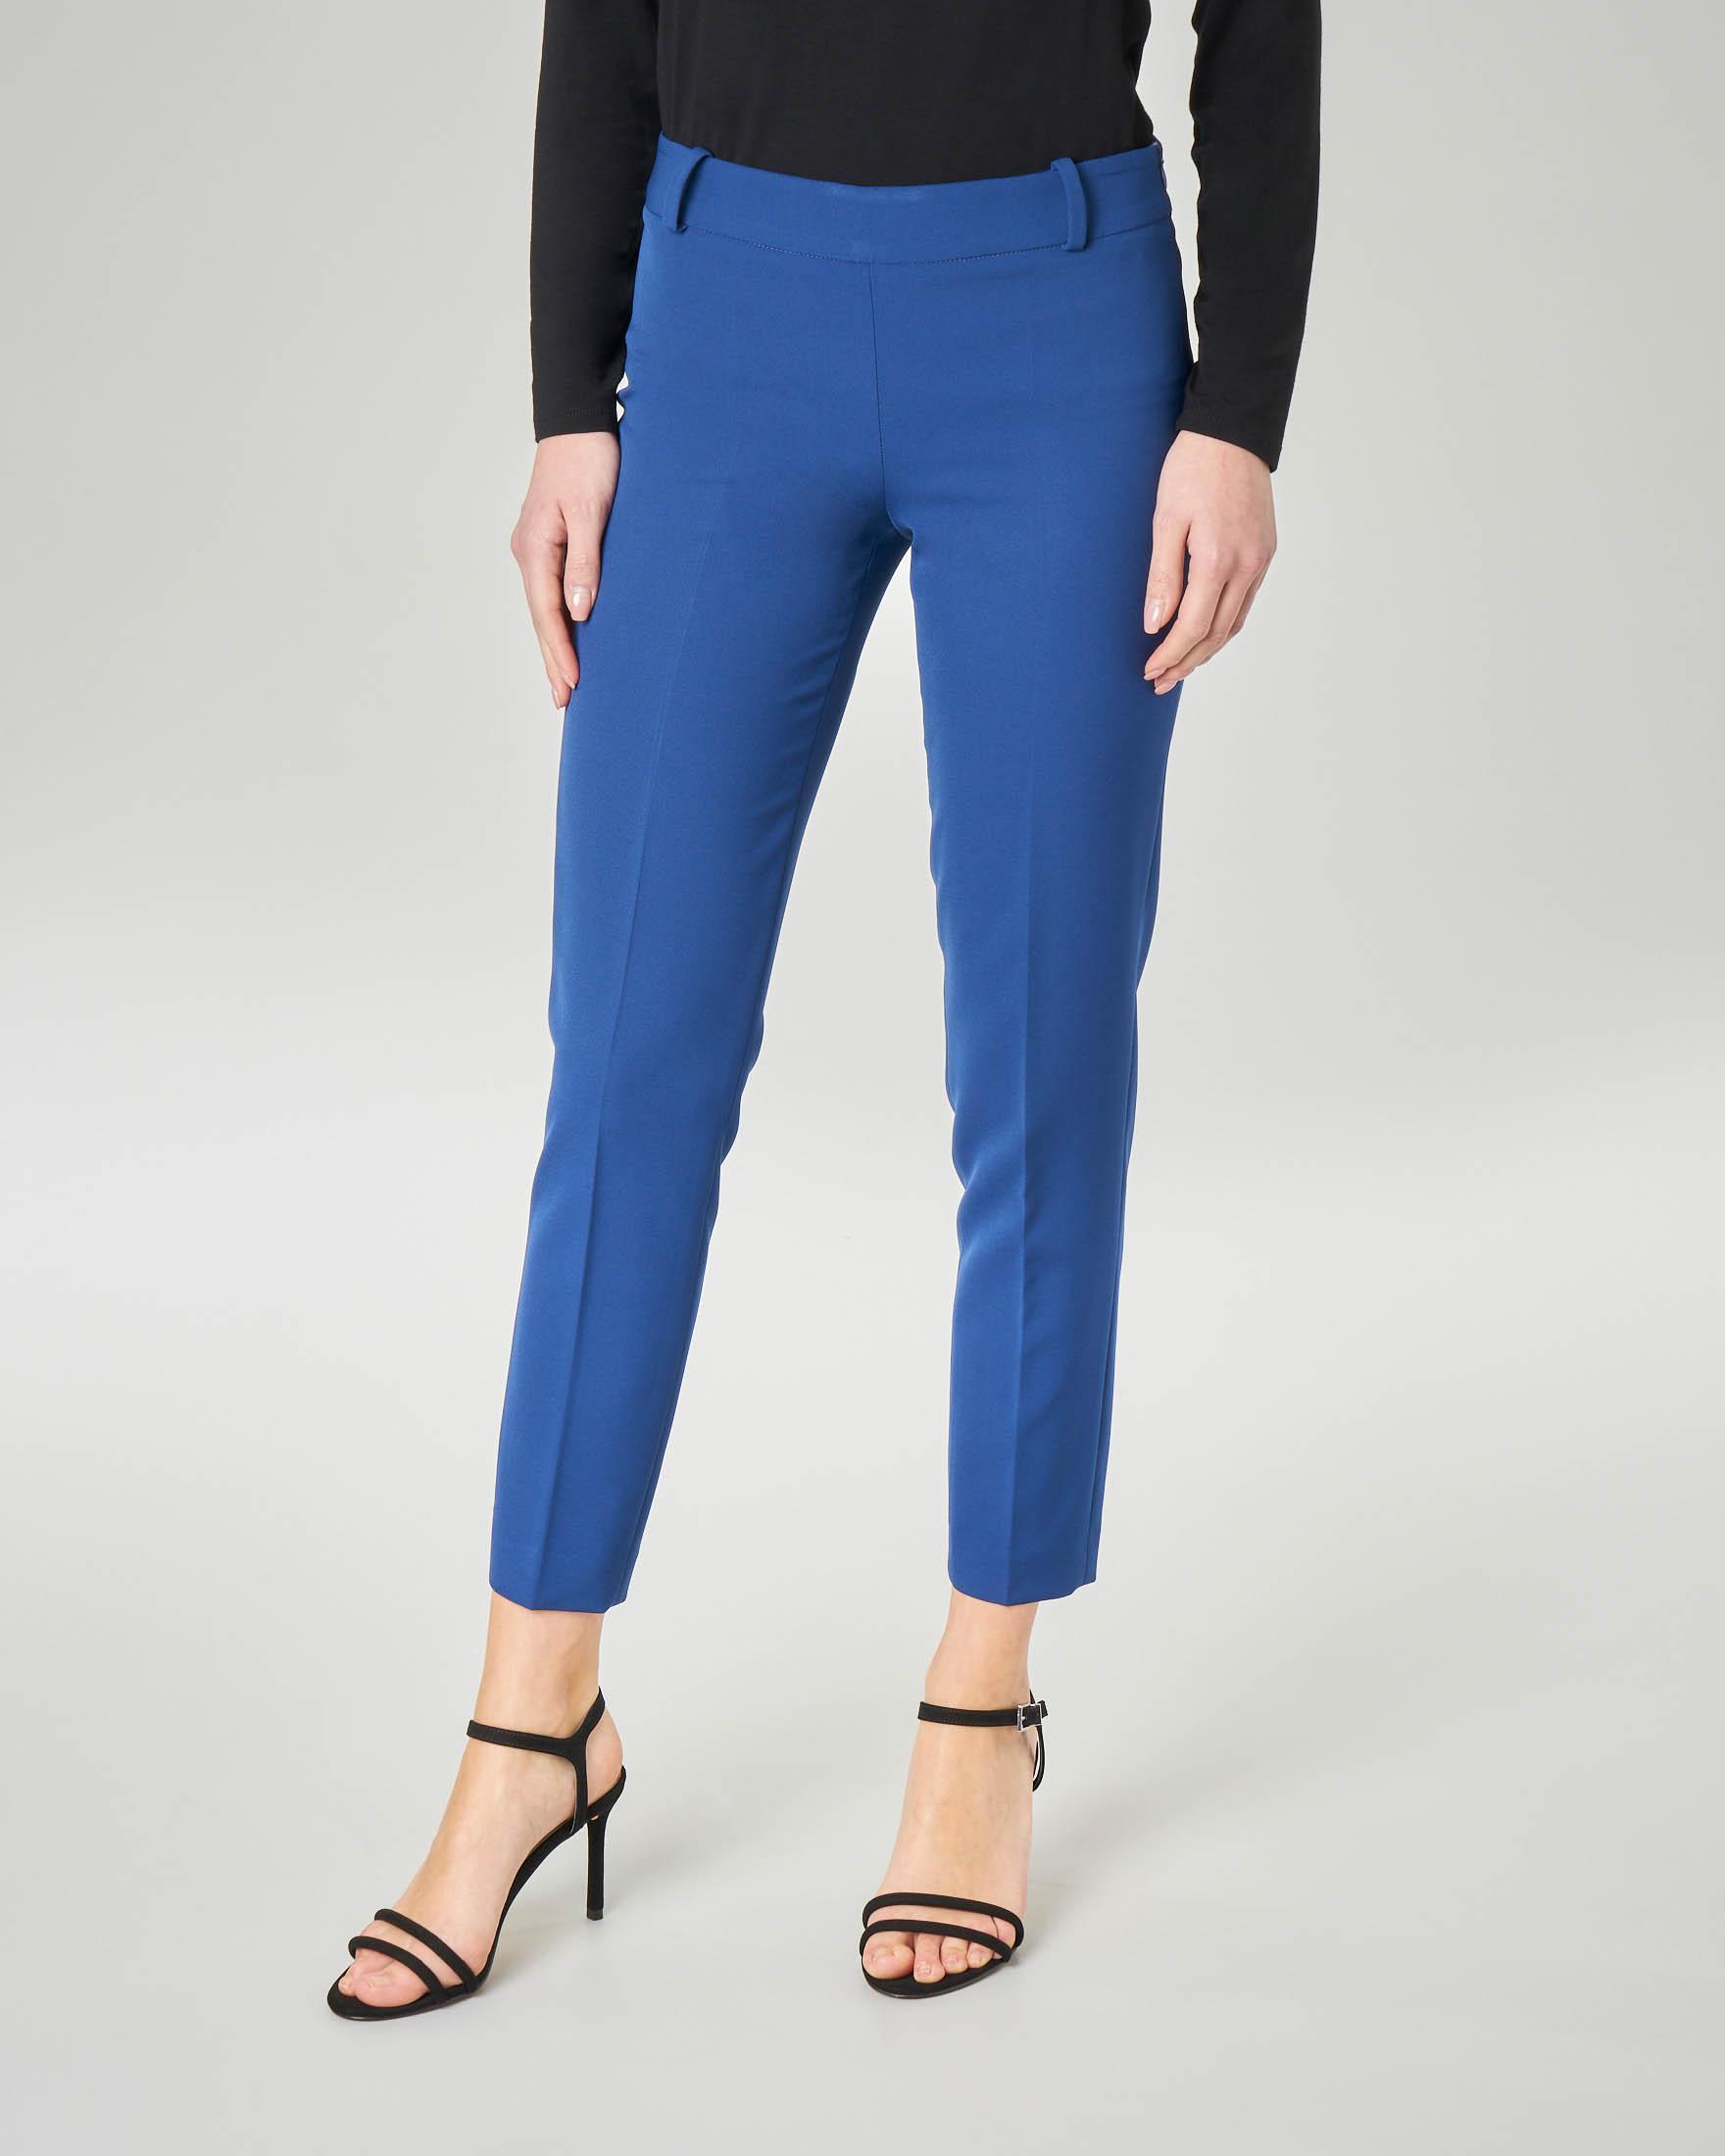 Pantalone blu china in cady lunghezza alla caviglia